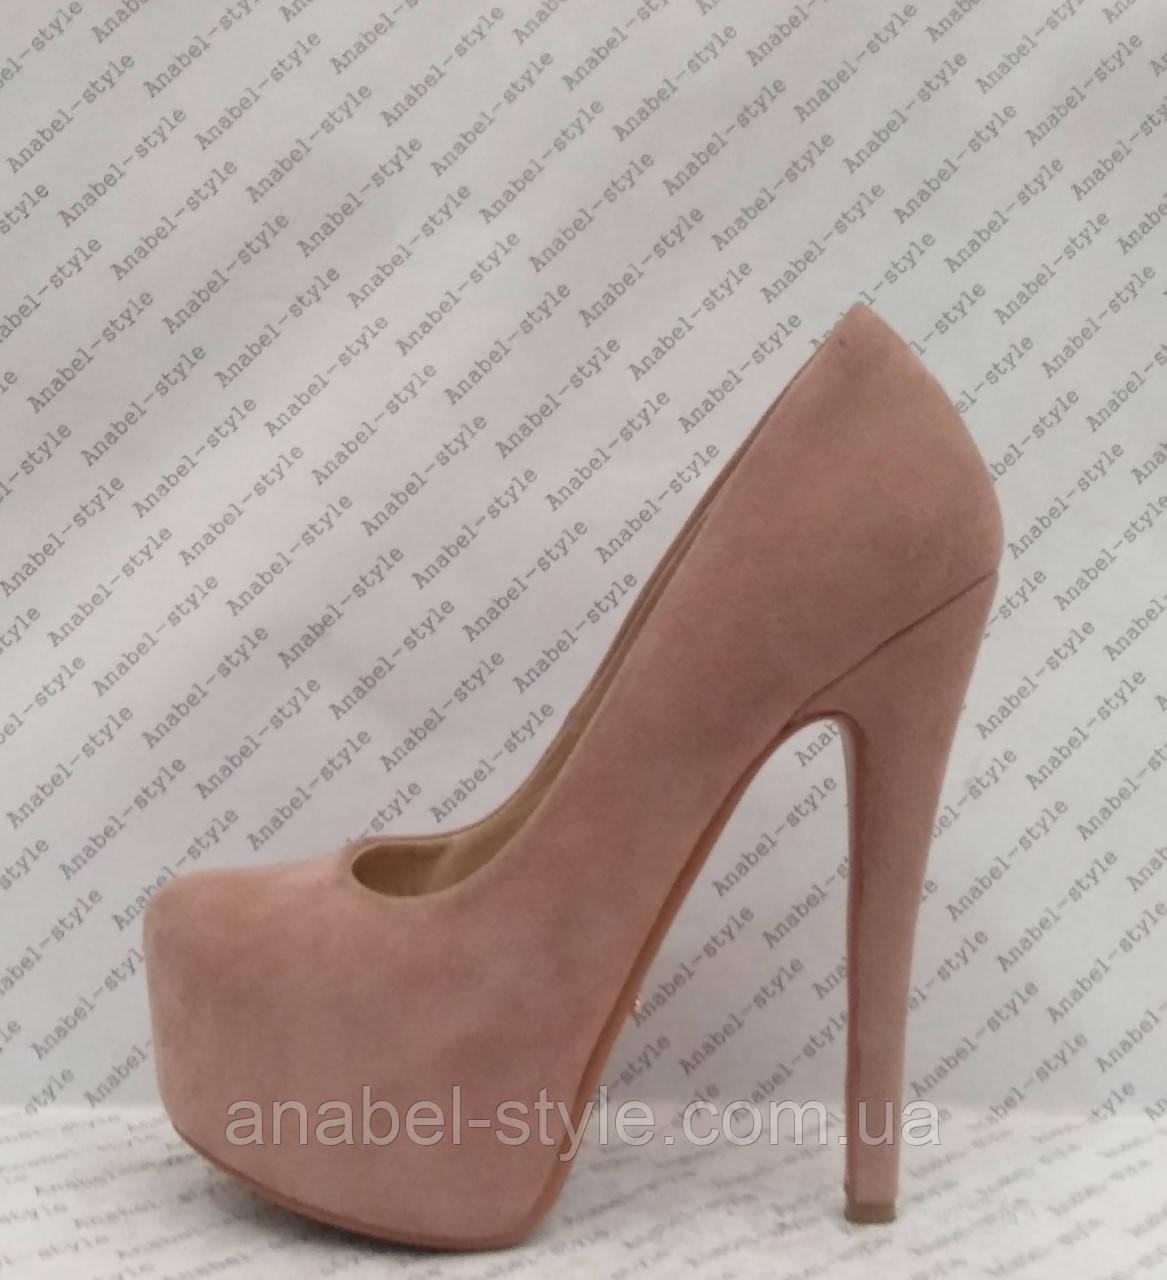 Туфли женские замшевые на каблуке Ла6уте$ Loubouti$ цвета пудры Код 2076